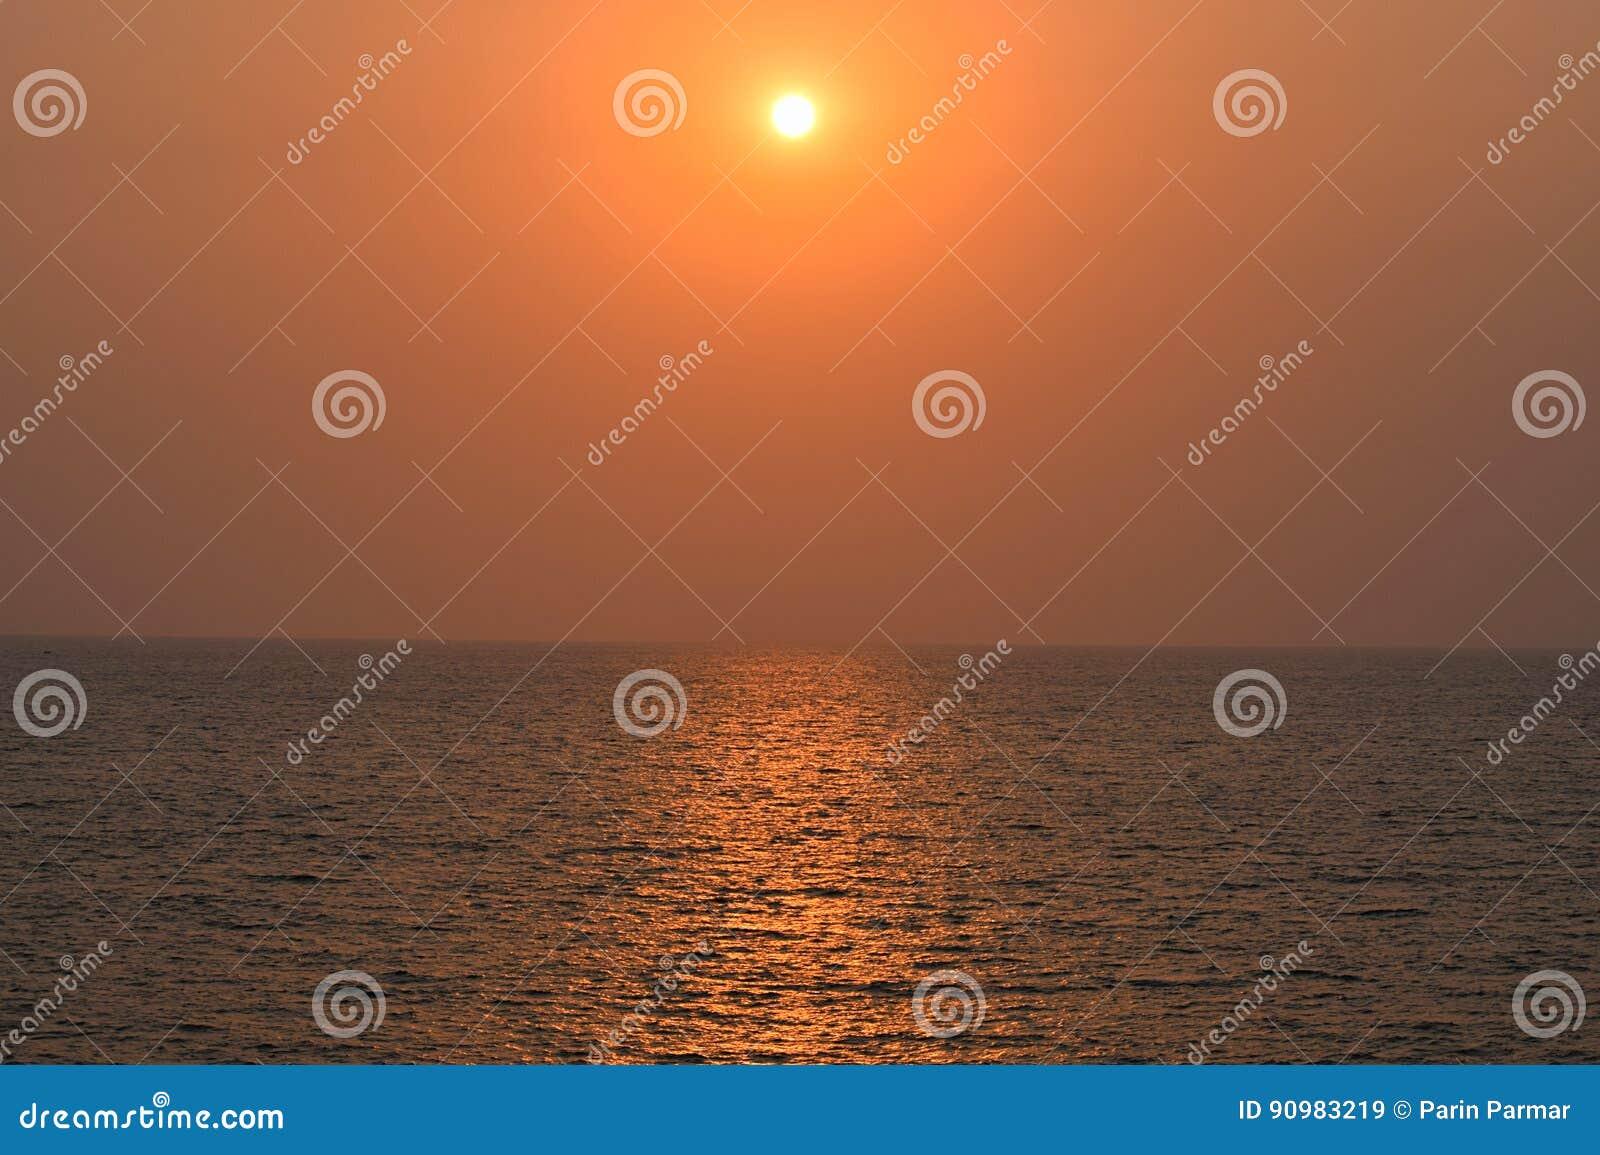 Golden Sunset over Infinite Ocean